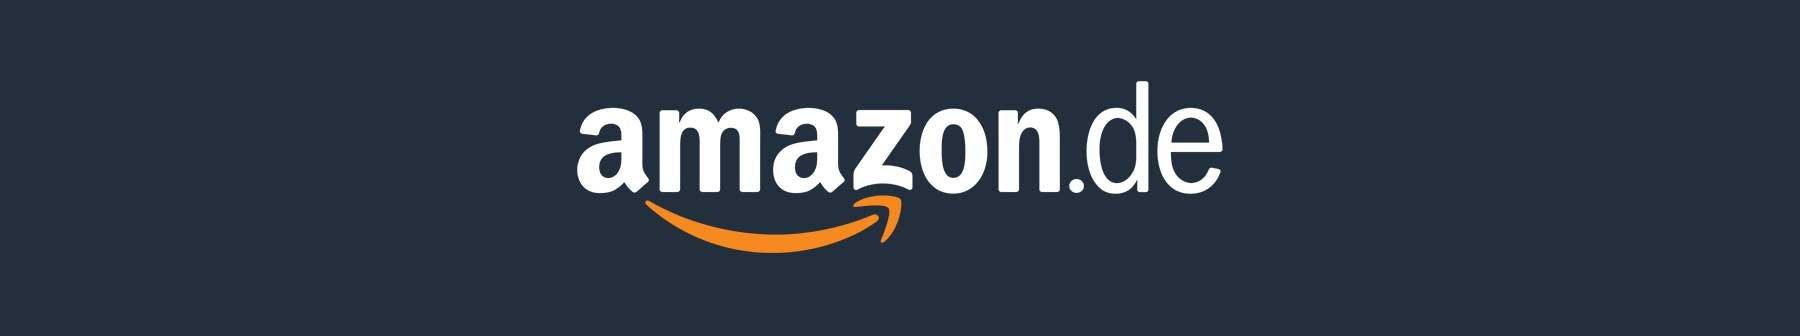 seriesly AWESOME via Amazon unterstützen